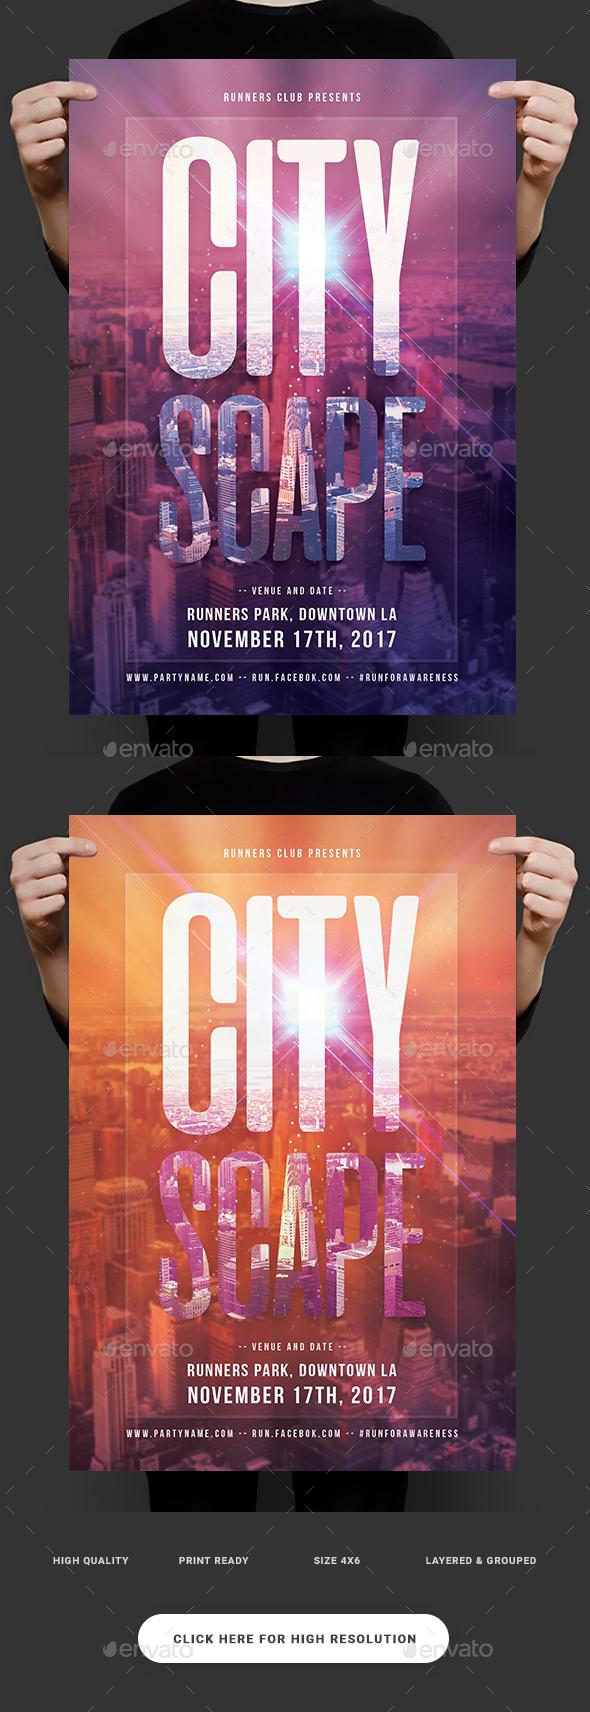 Urban CityScape Flyer